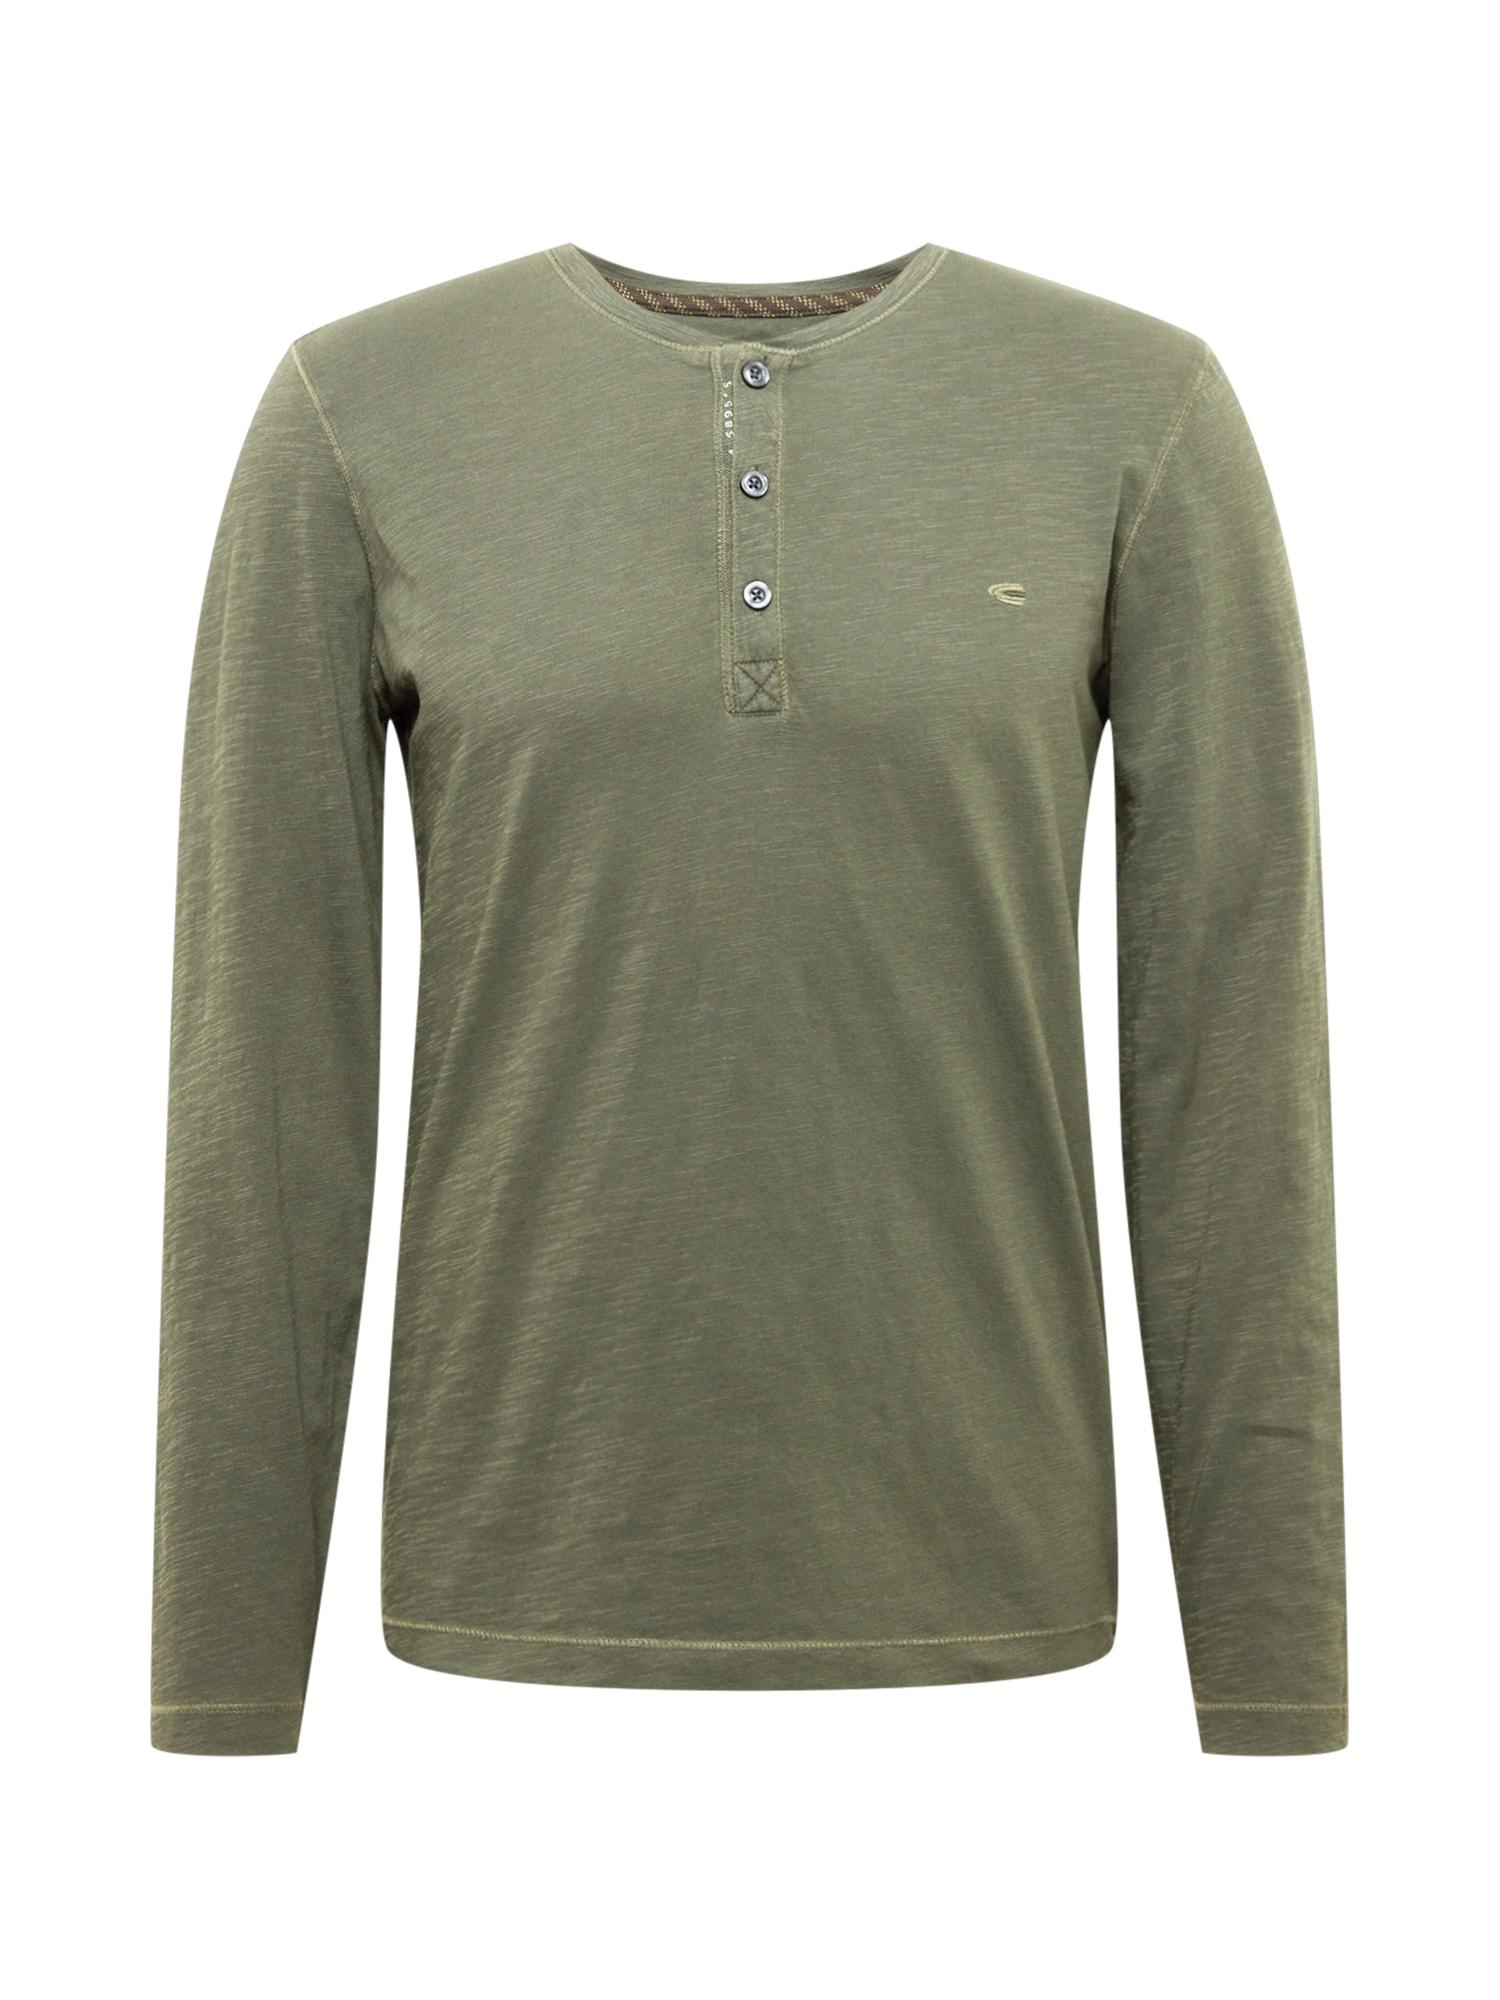 CAMEL ACTIVE Marškinėliai įdegio spalva